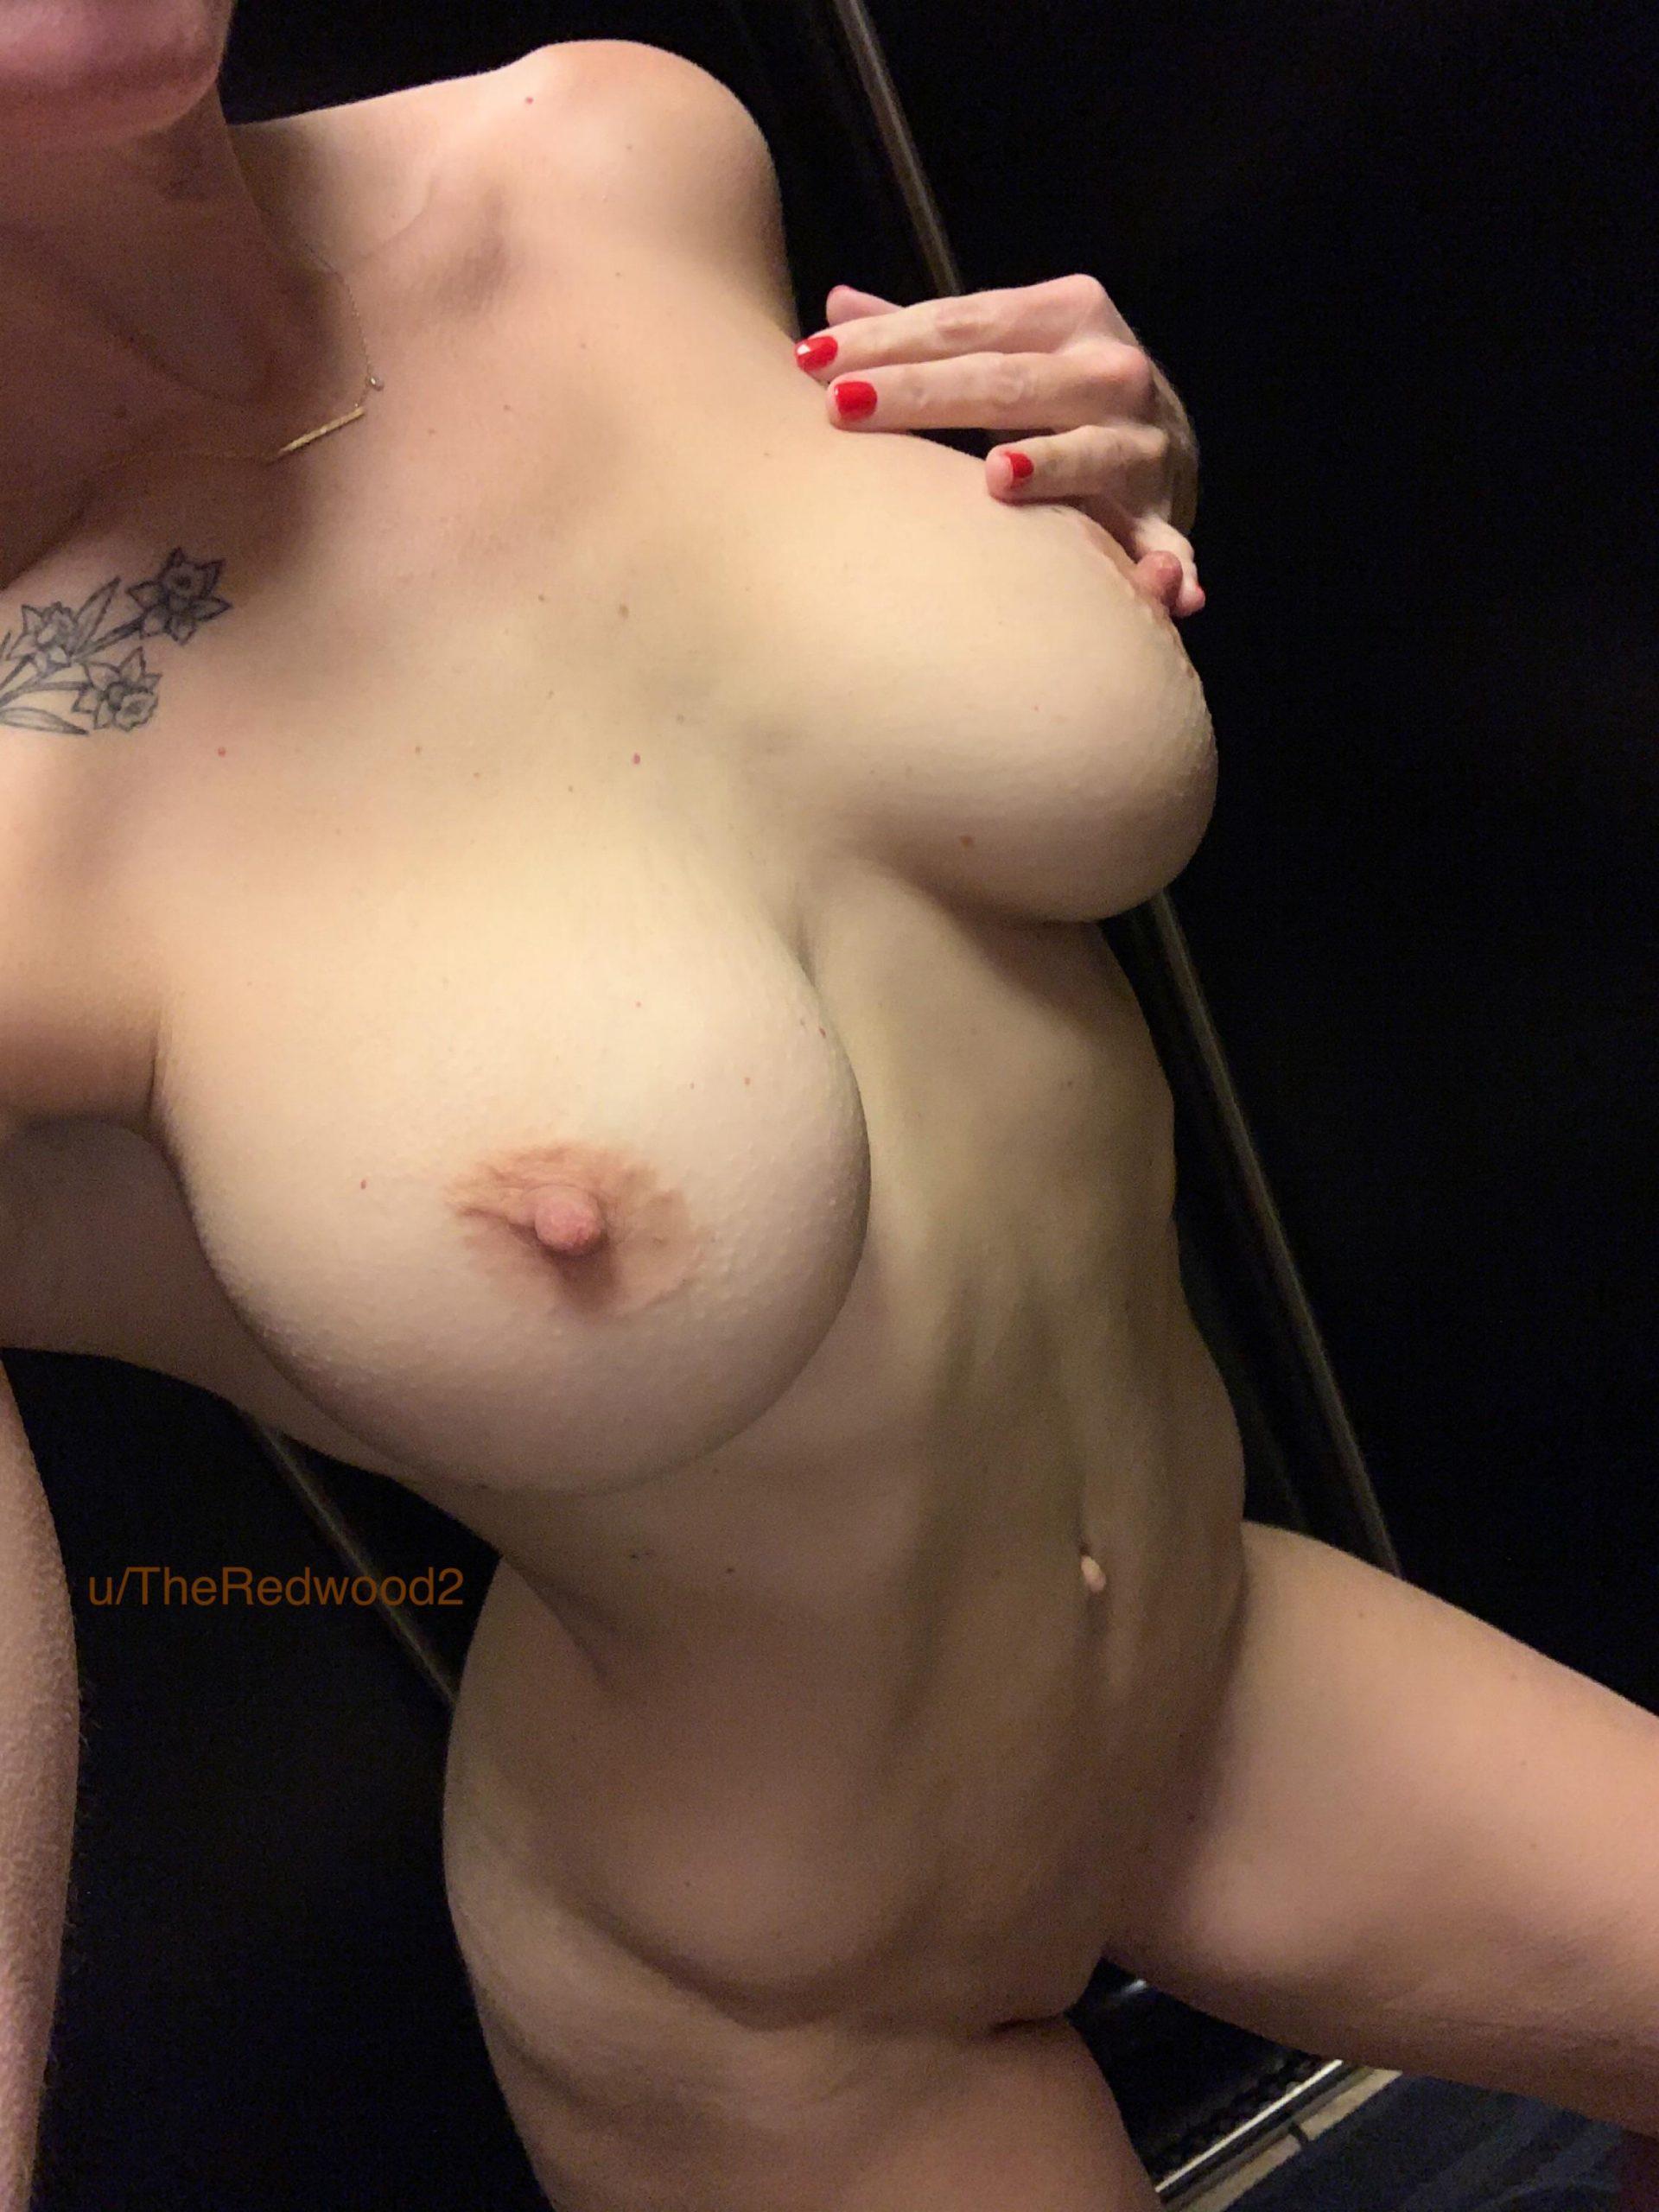 Post Shower Titties ?